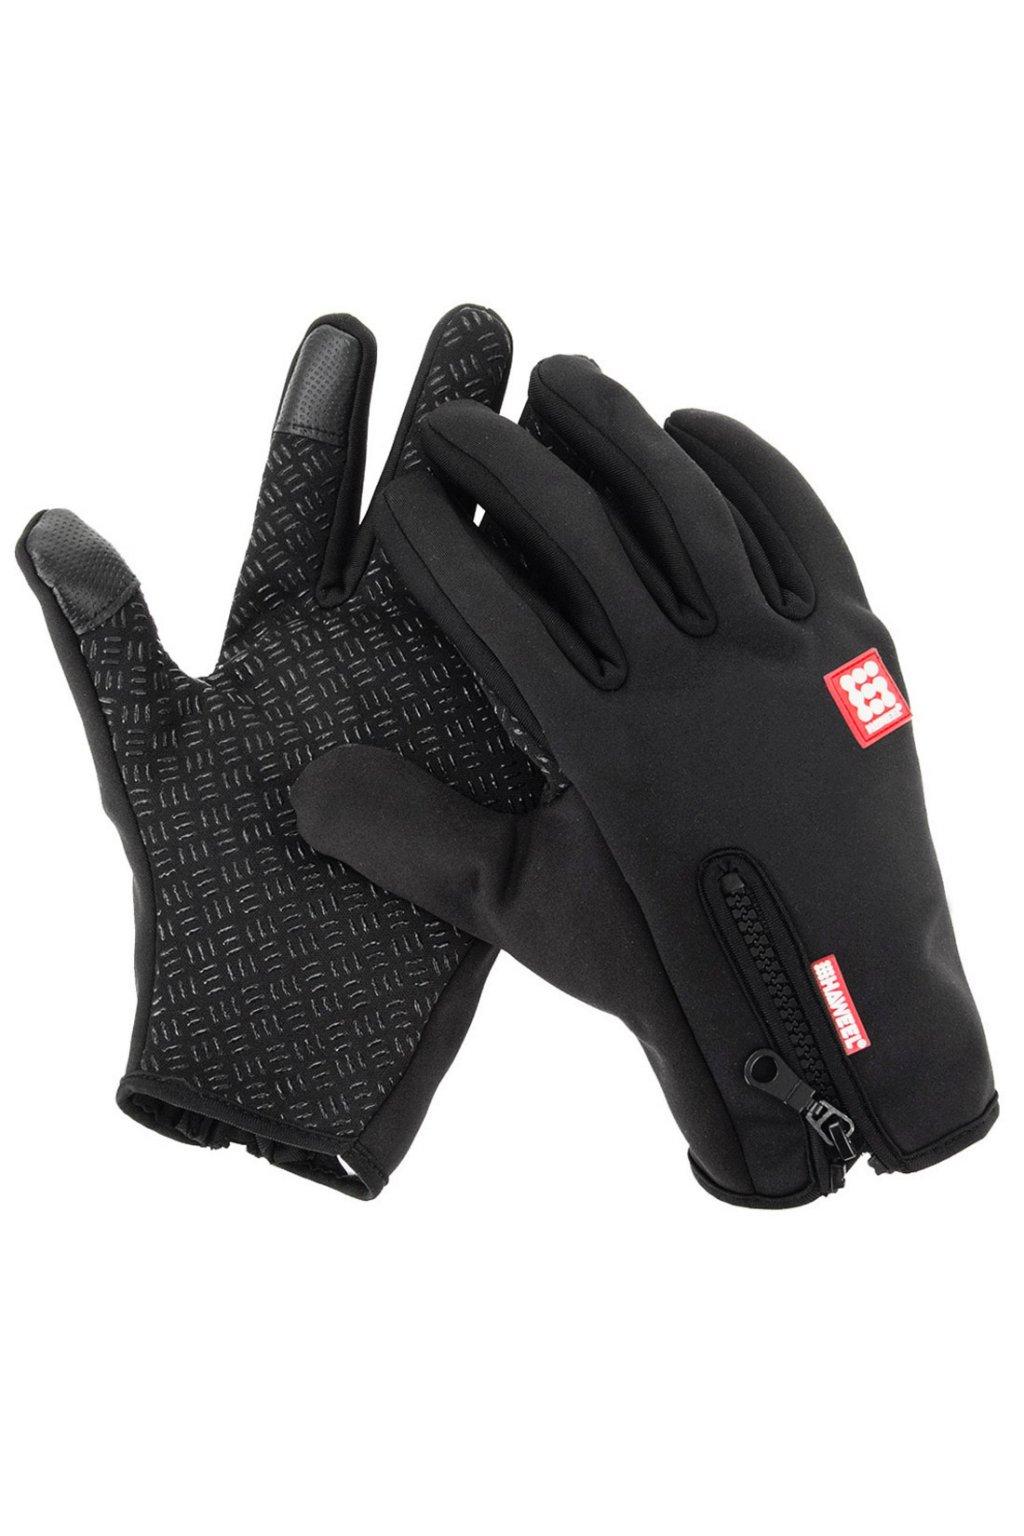 Outdoorové rukavice HAWEEL, vel. M